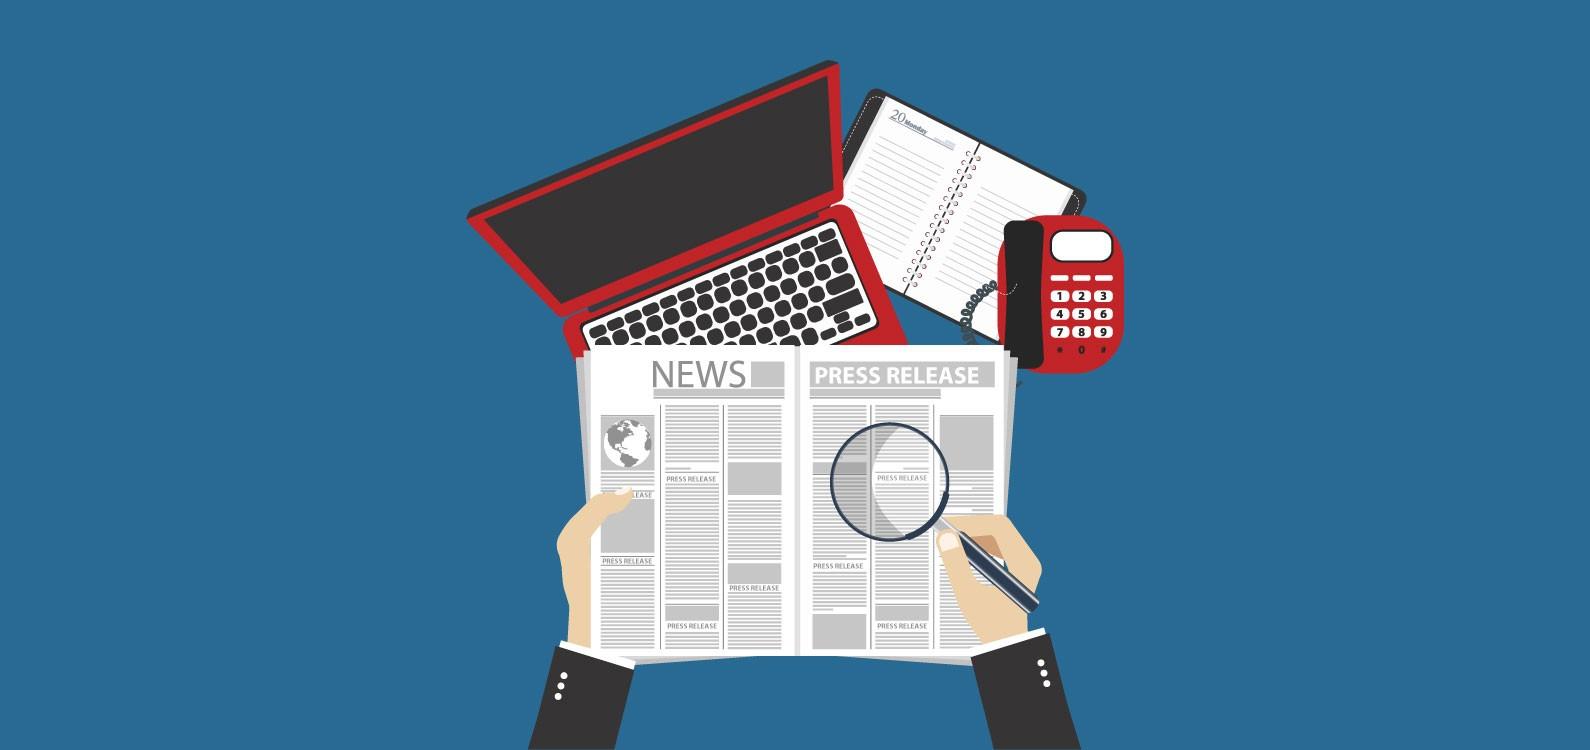 Press Release Services